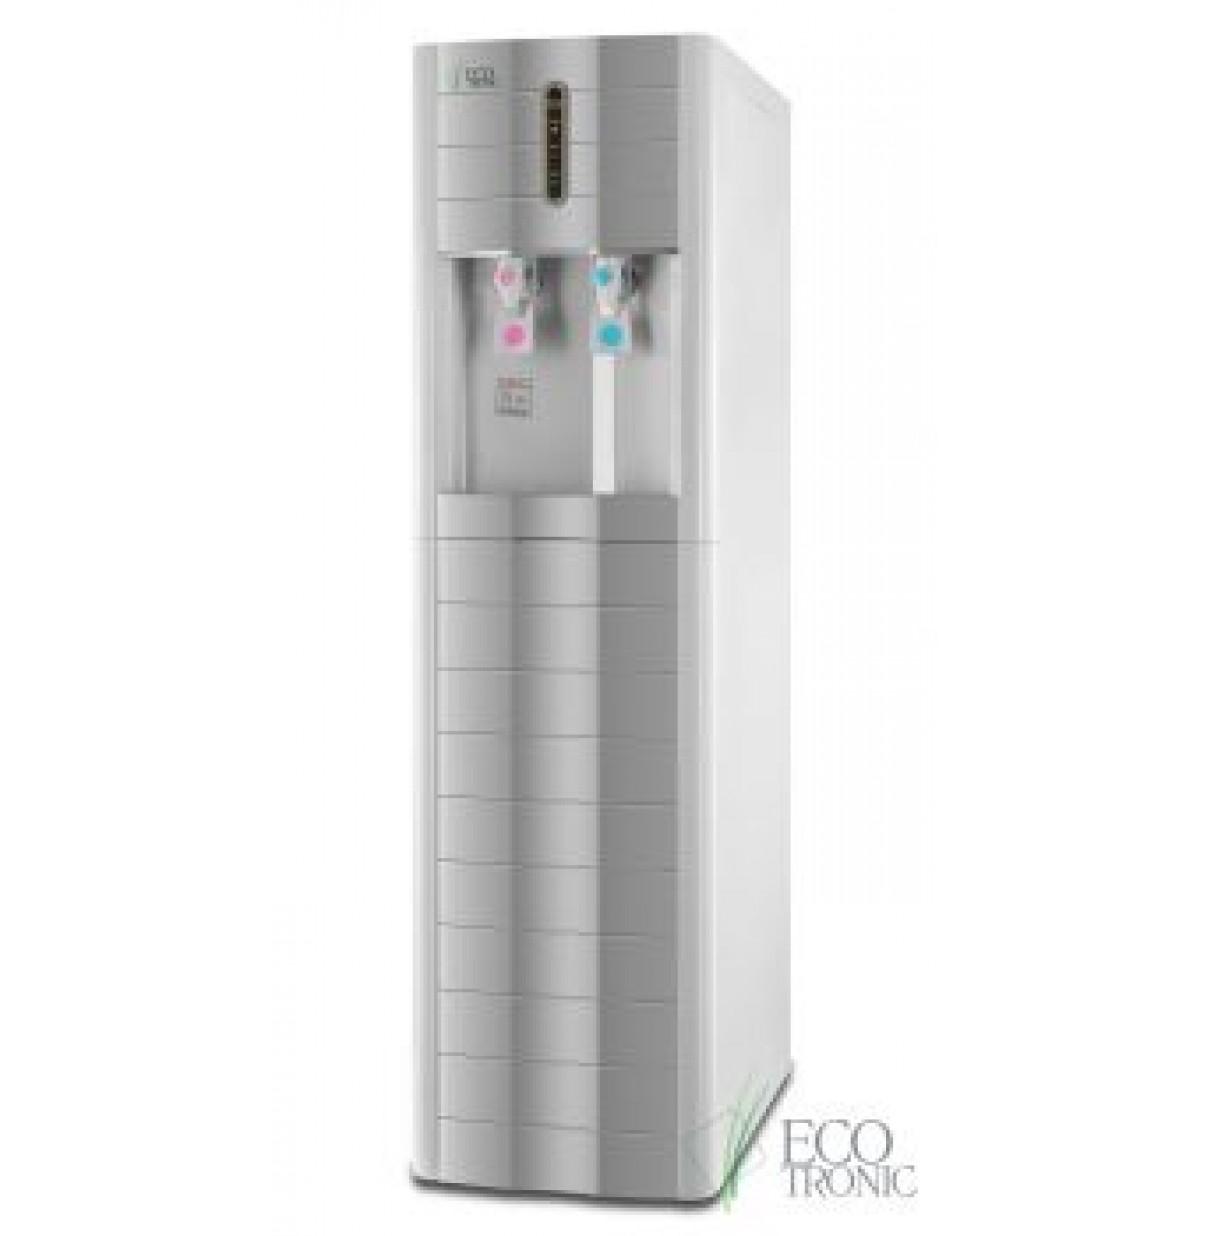 Пурифайер Ecotronic V42-U4L wite